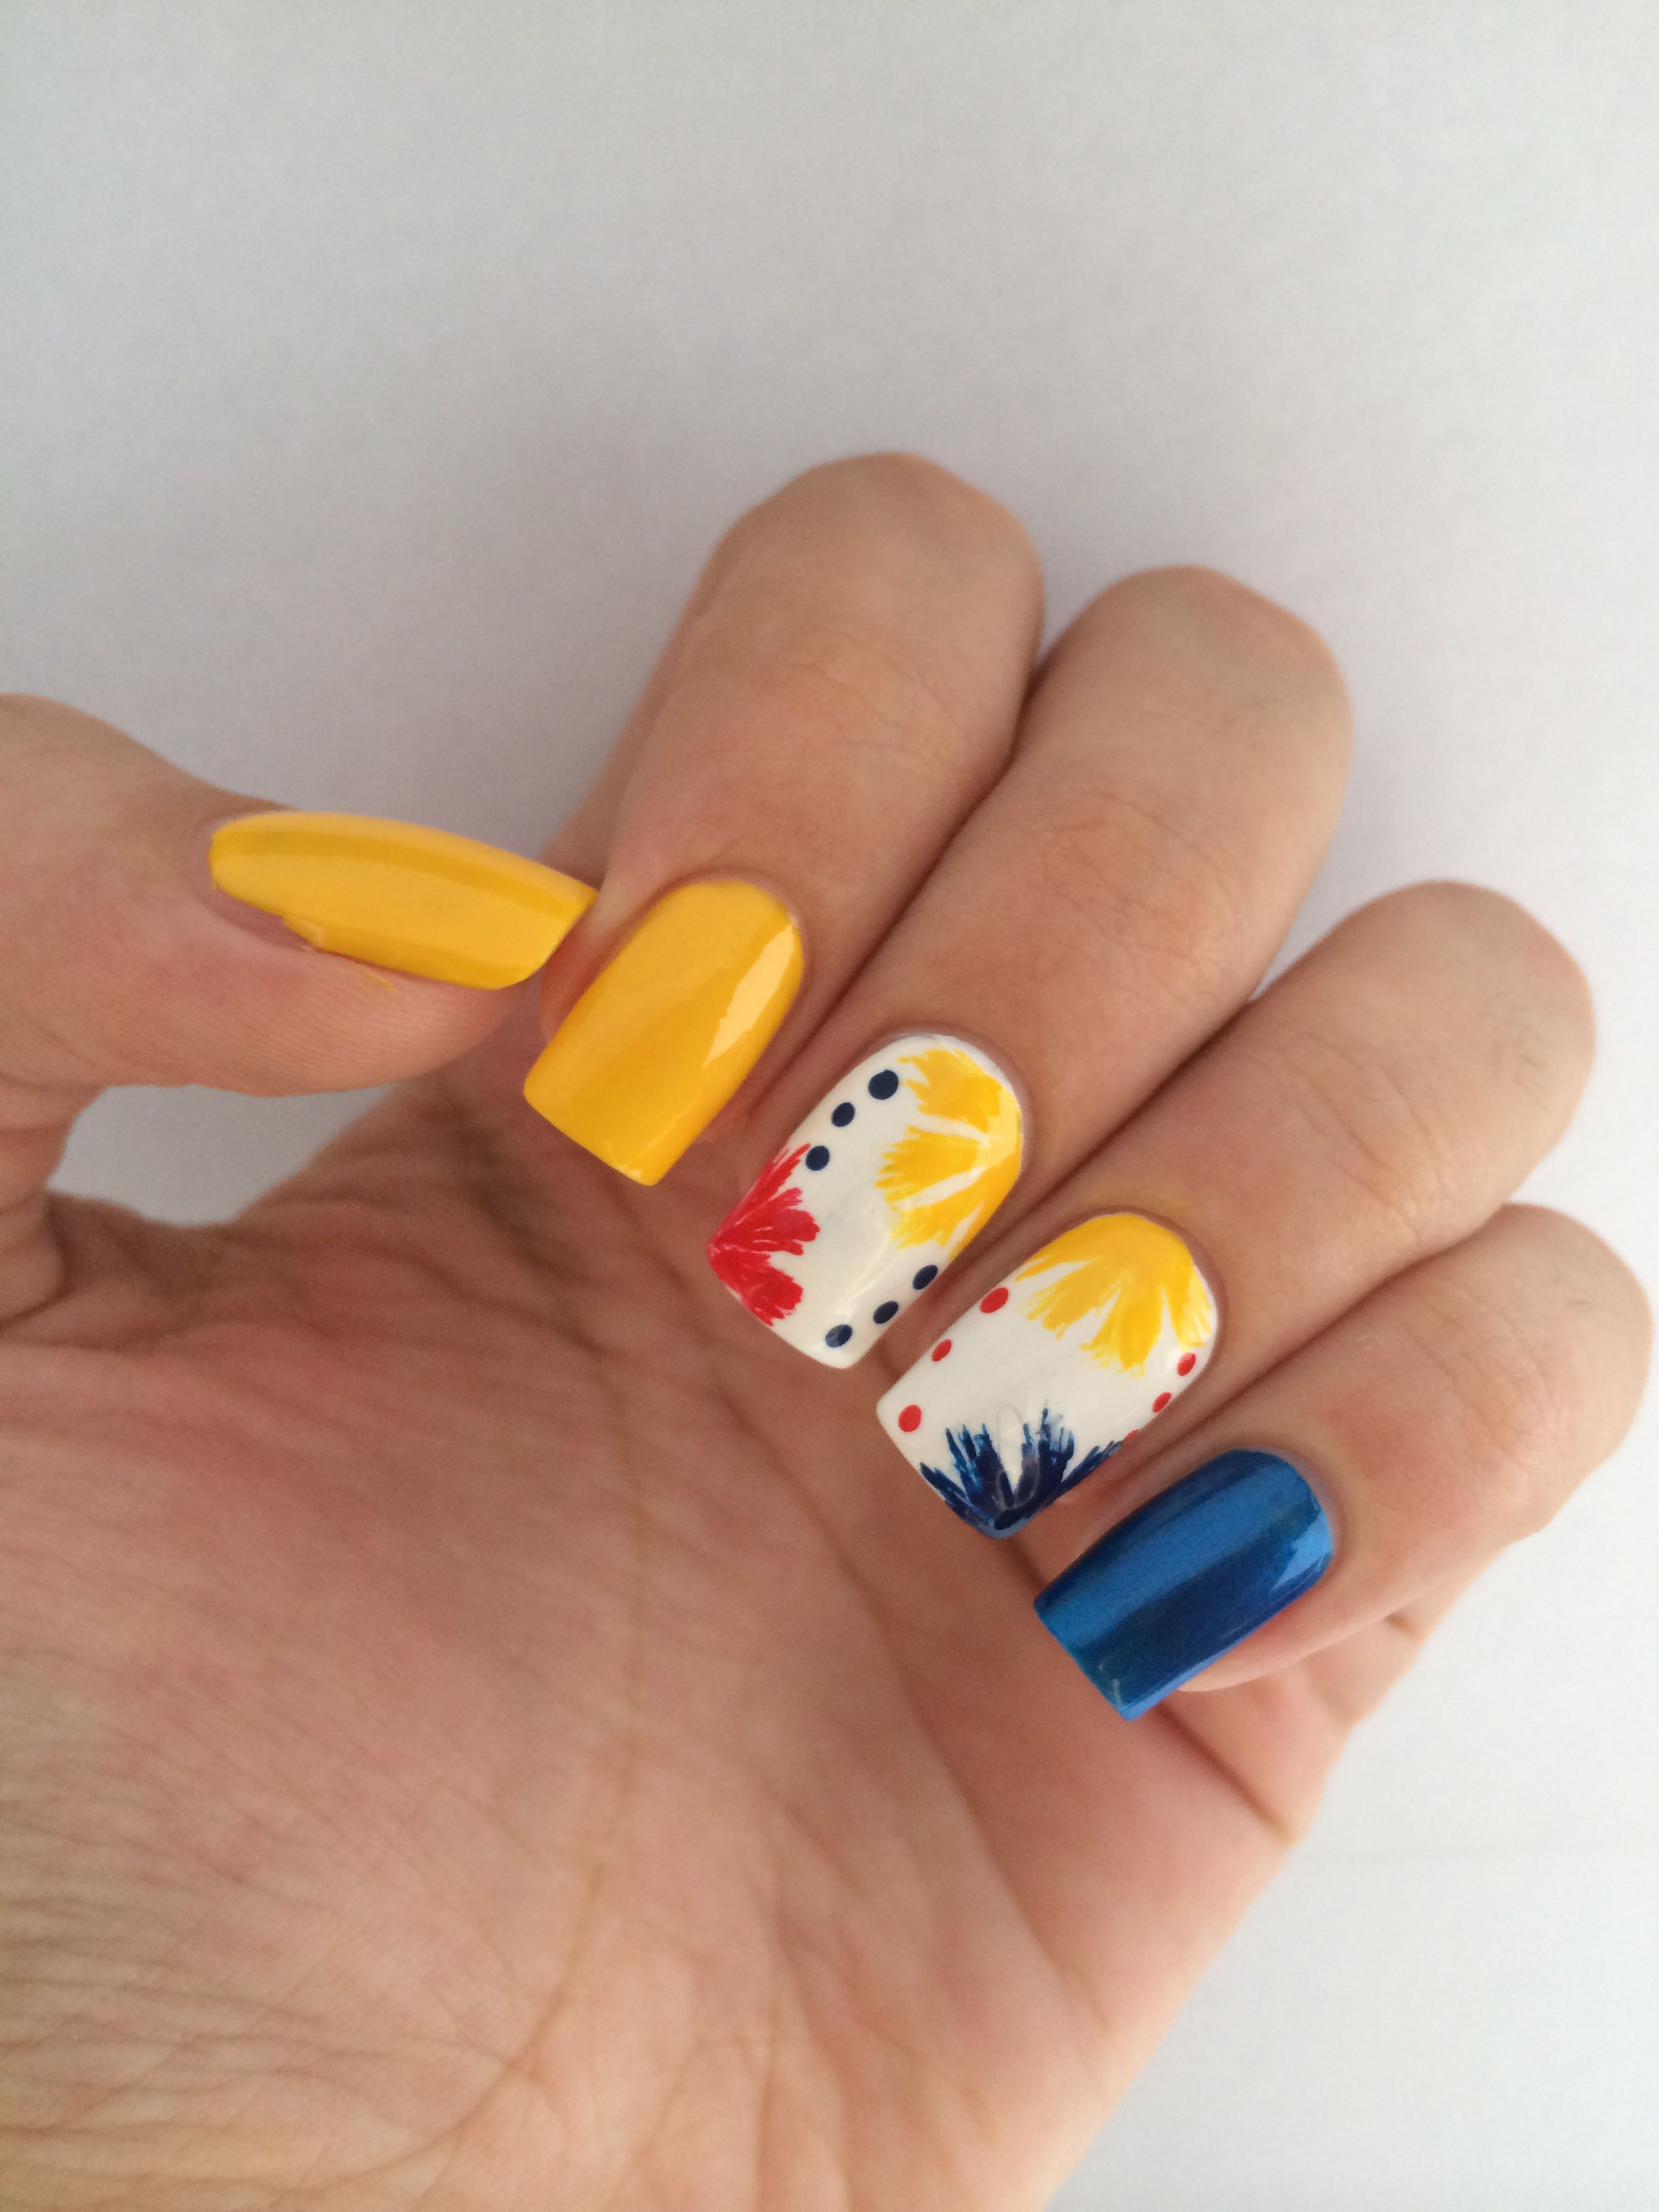 Colombia Fifa World Cup Uas Colombia Nails Nailart Nails